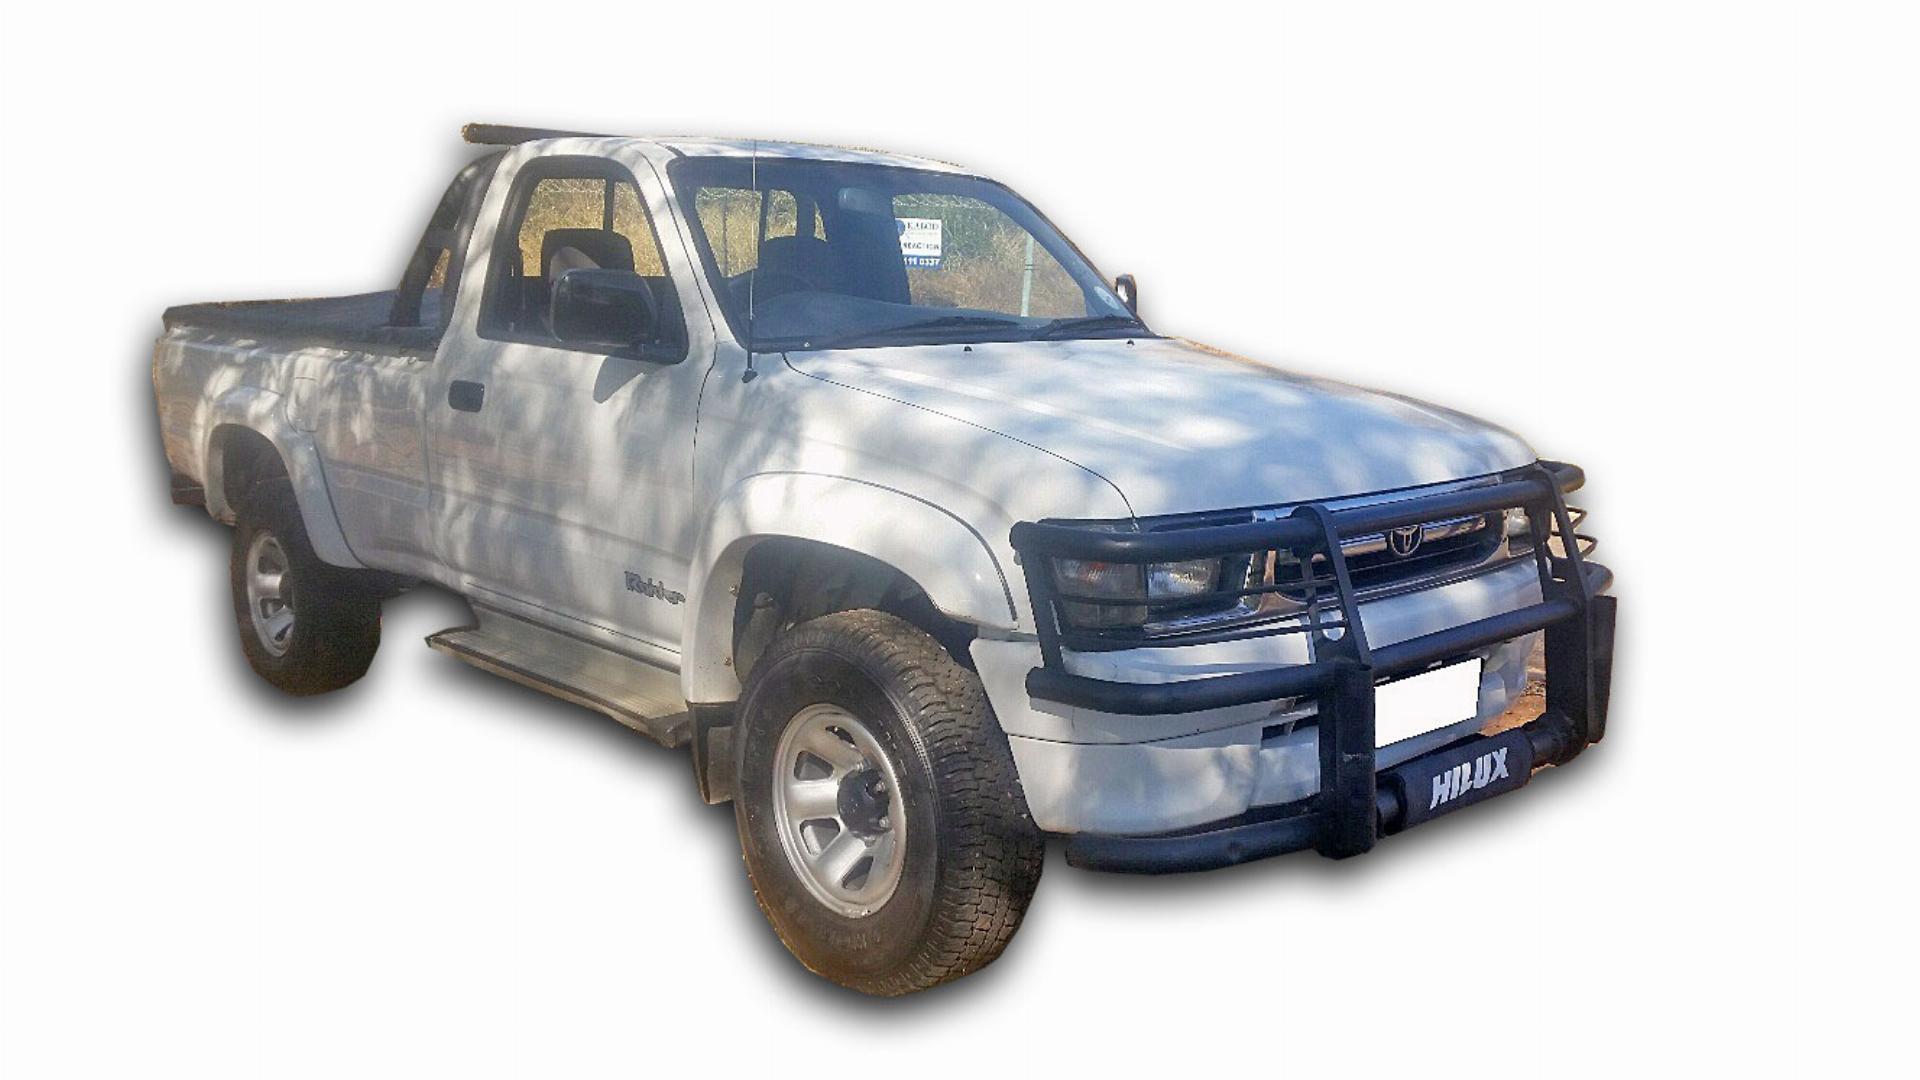 Toyota Hilux 2.7 Vvti Raider 4X2 Raised